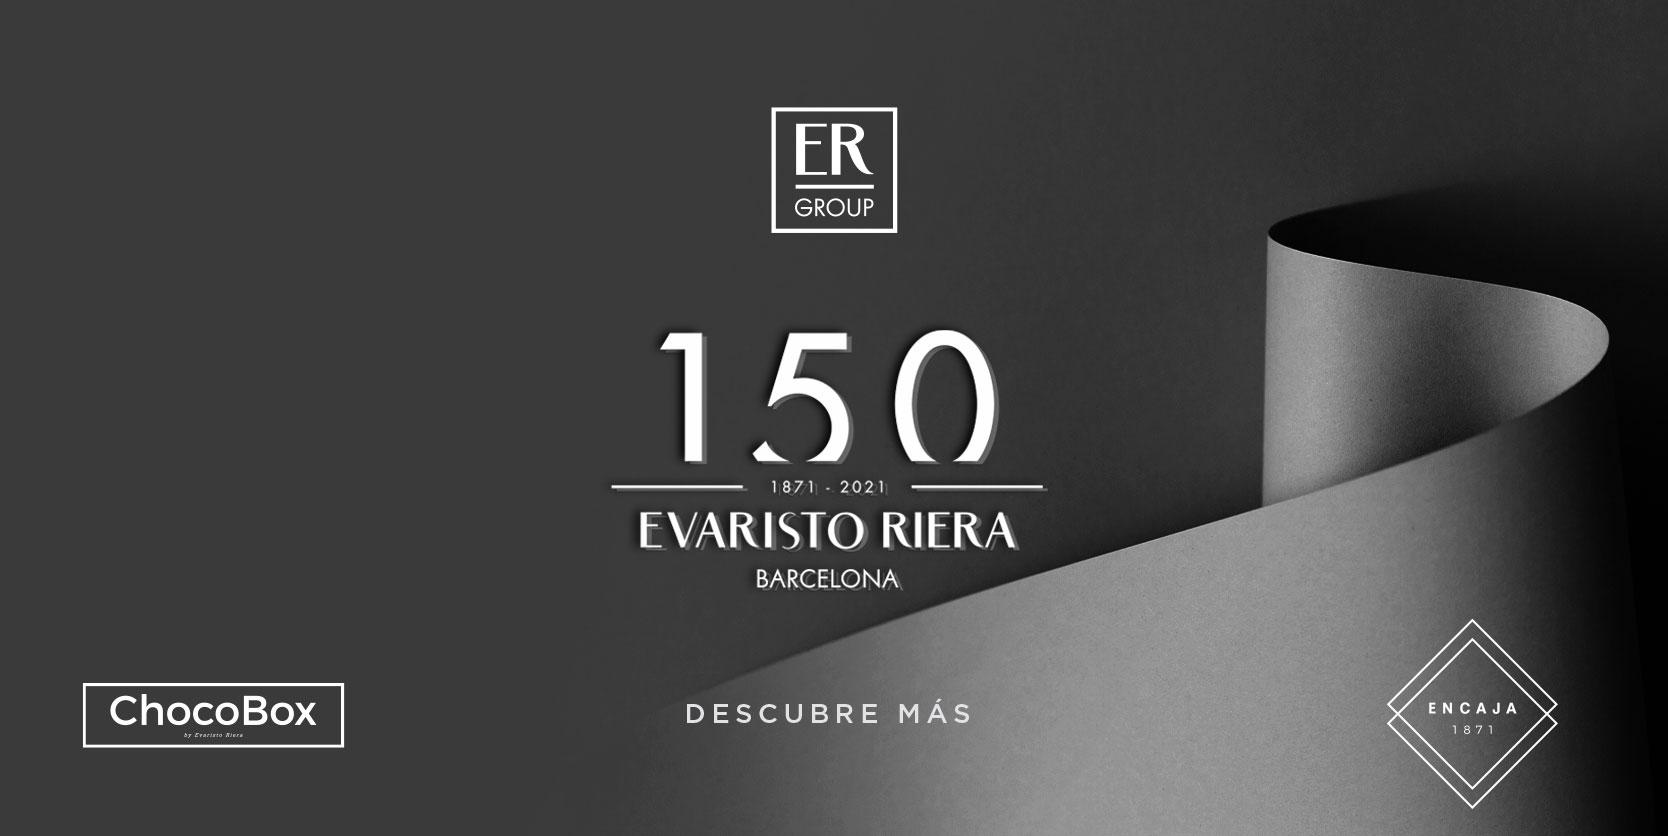 evaristo-riera-150-aniversario.jpg